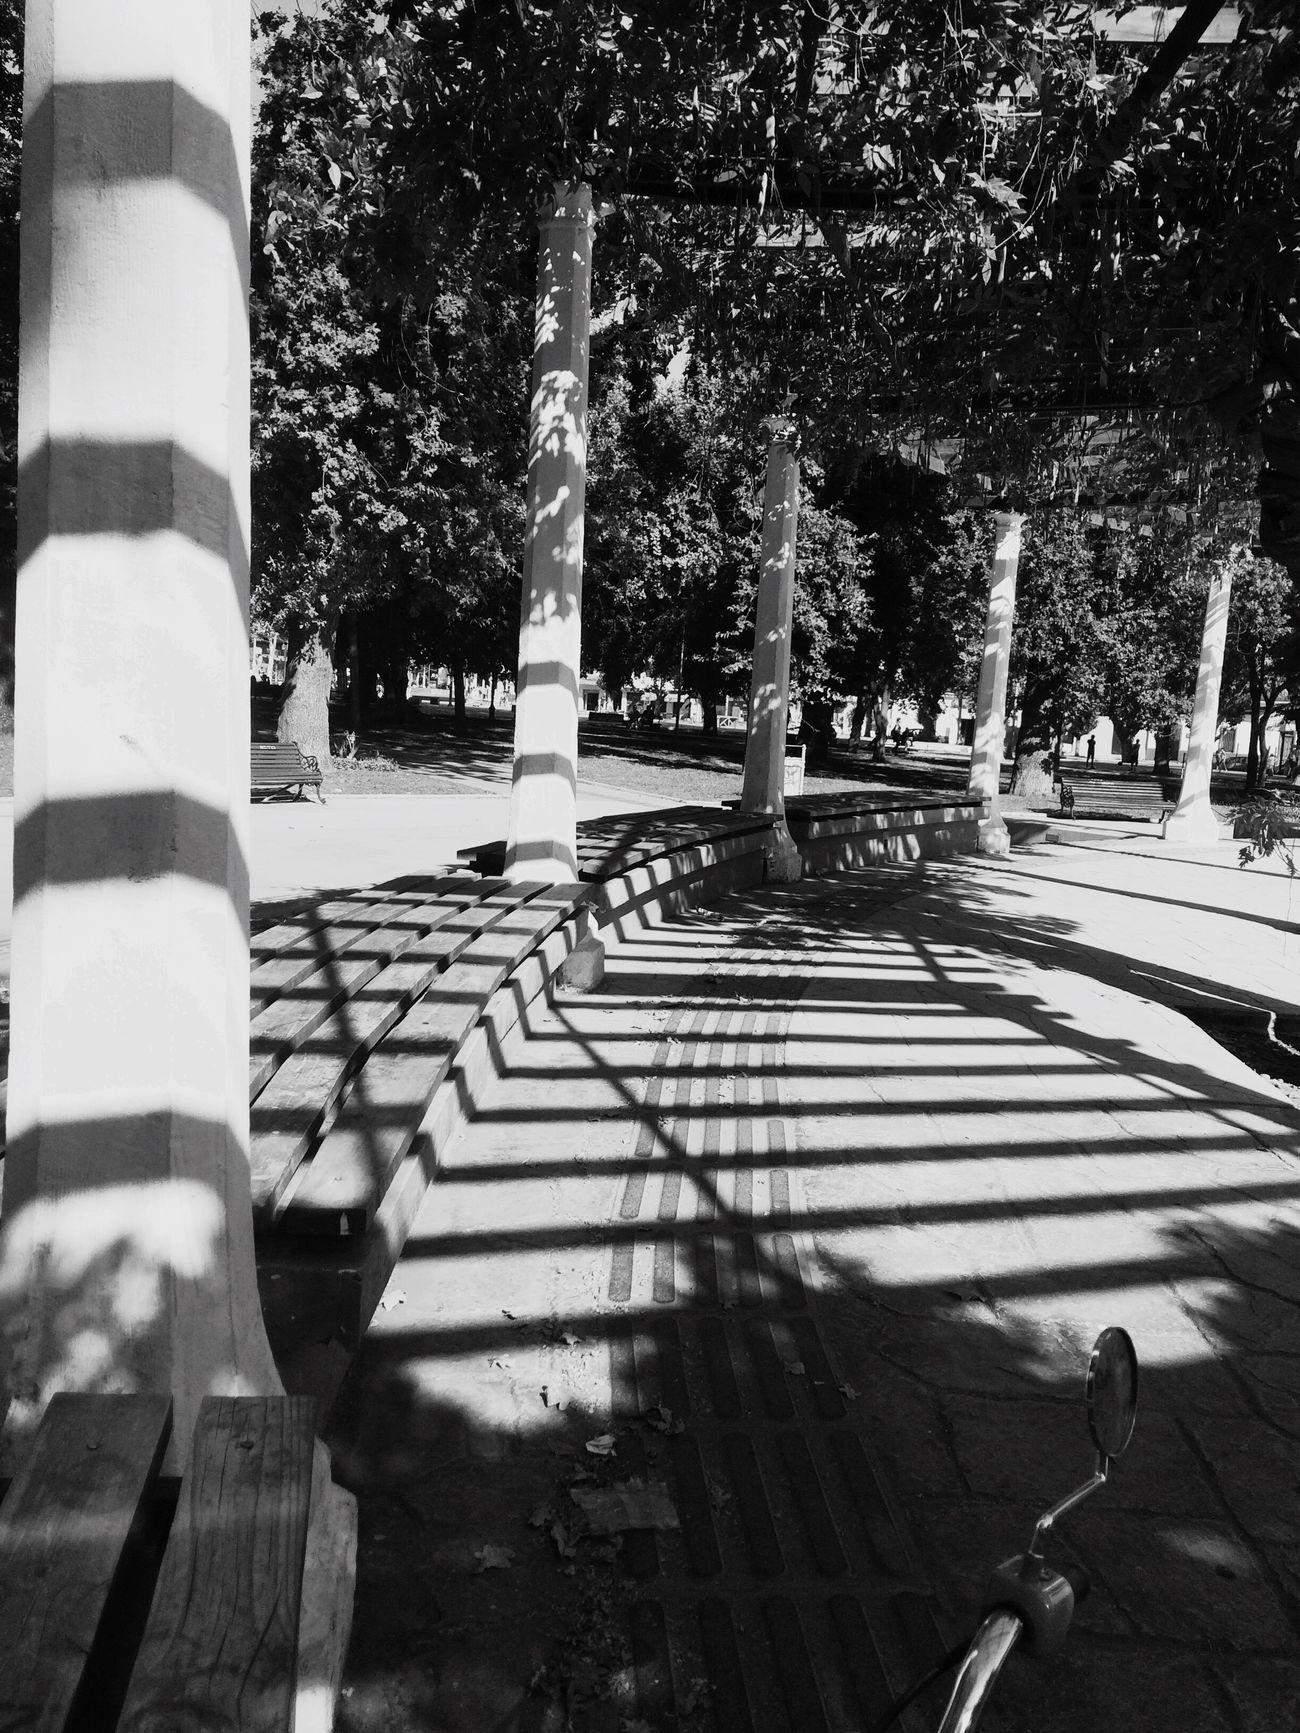 Plaza limache, verano atardecer, romántico